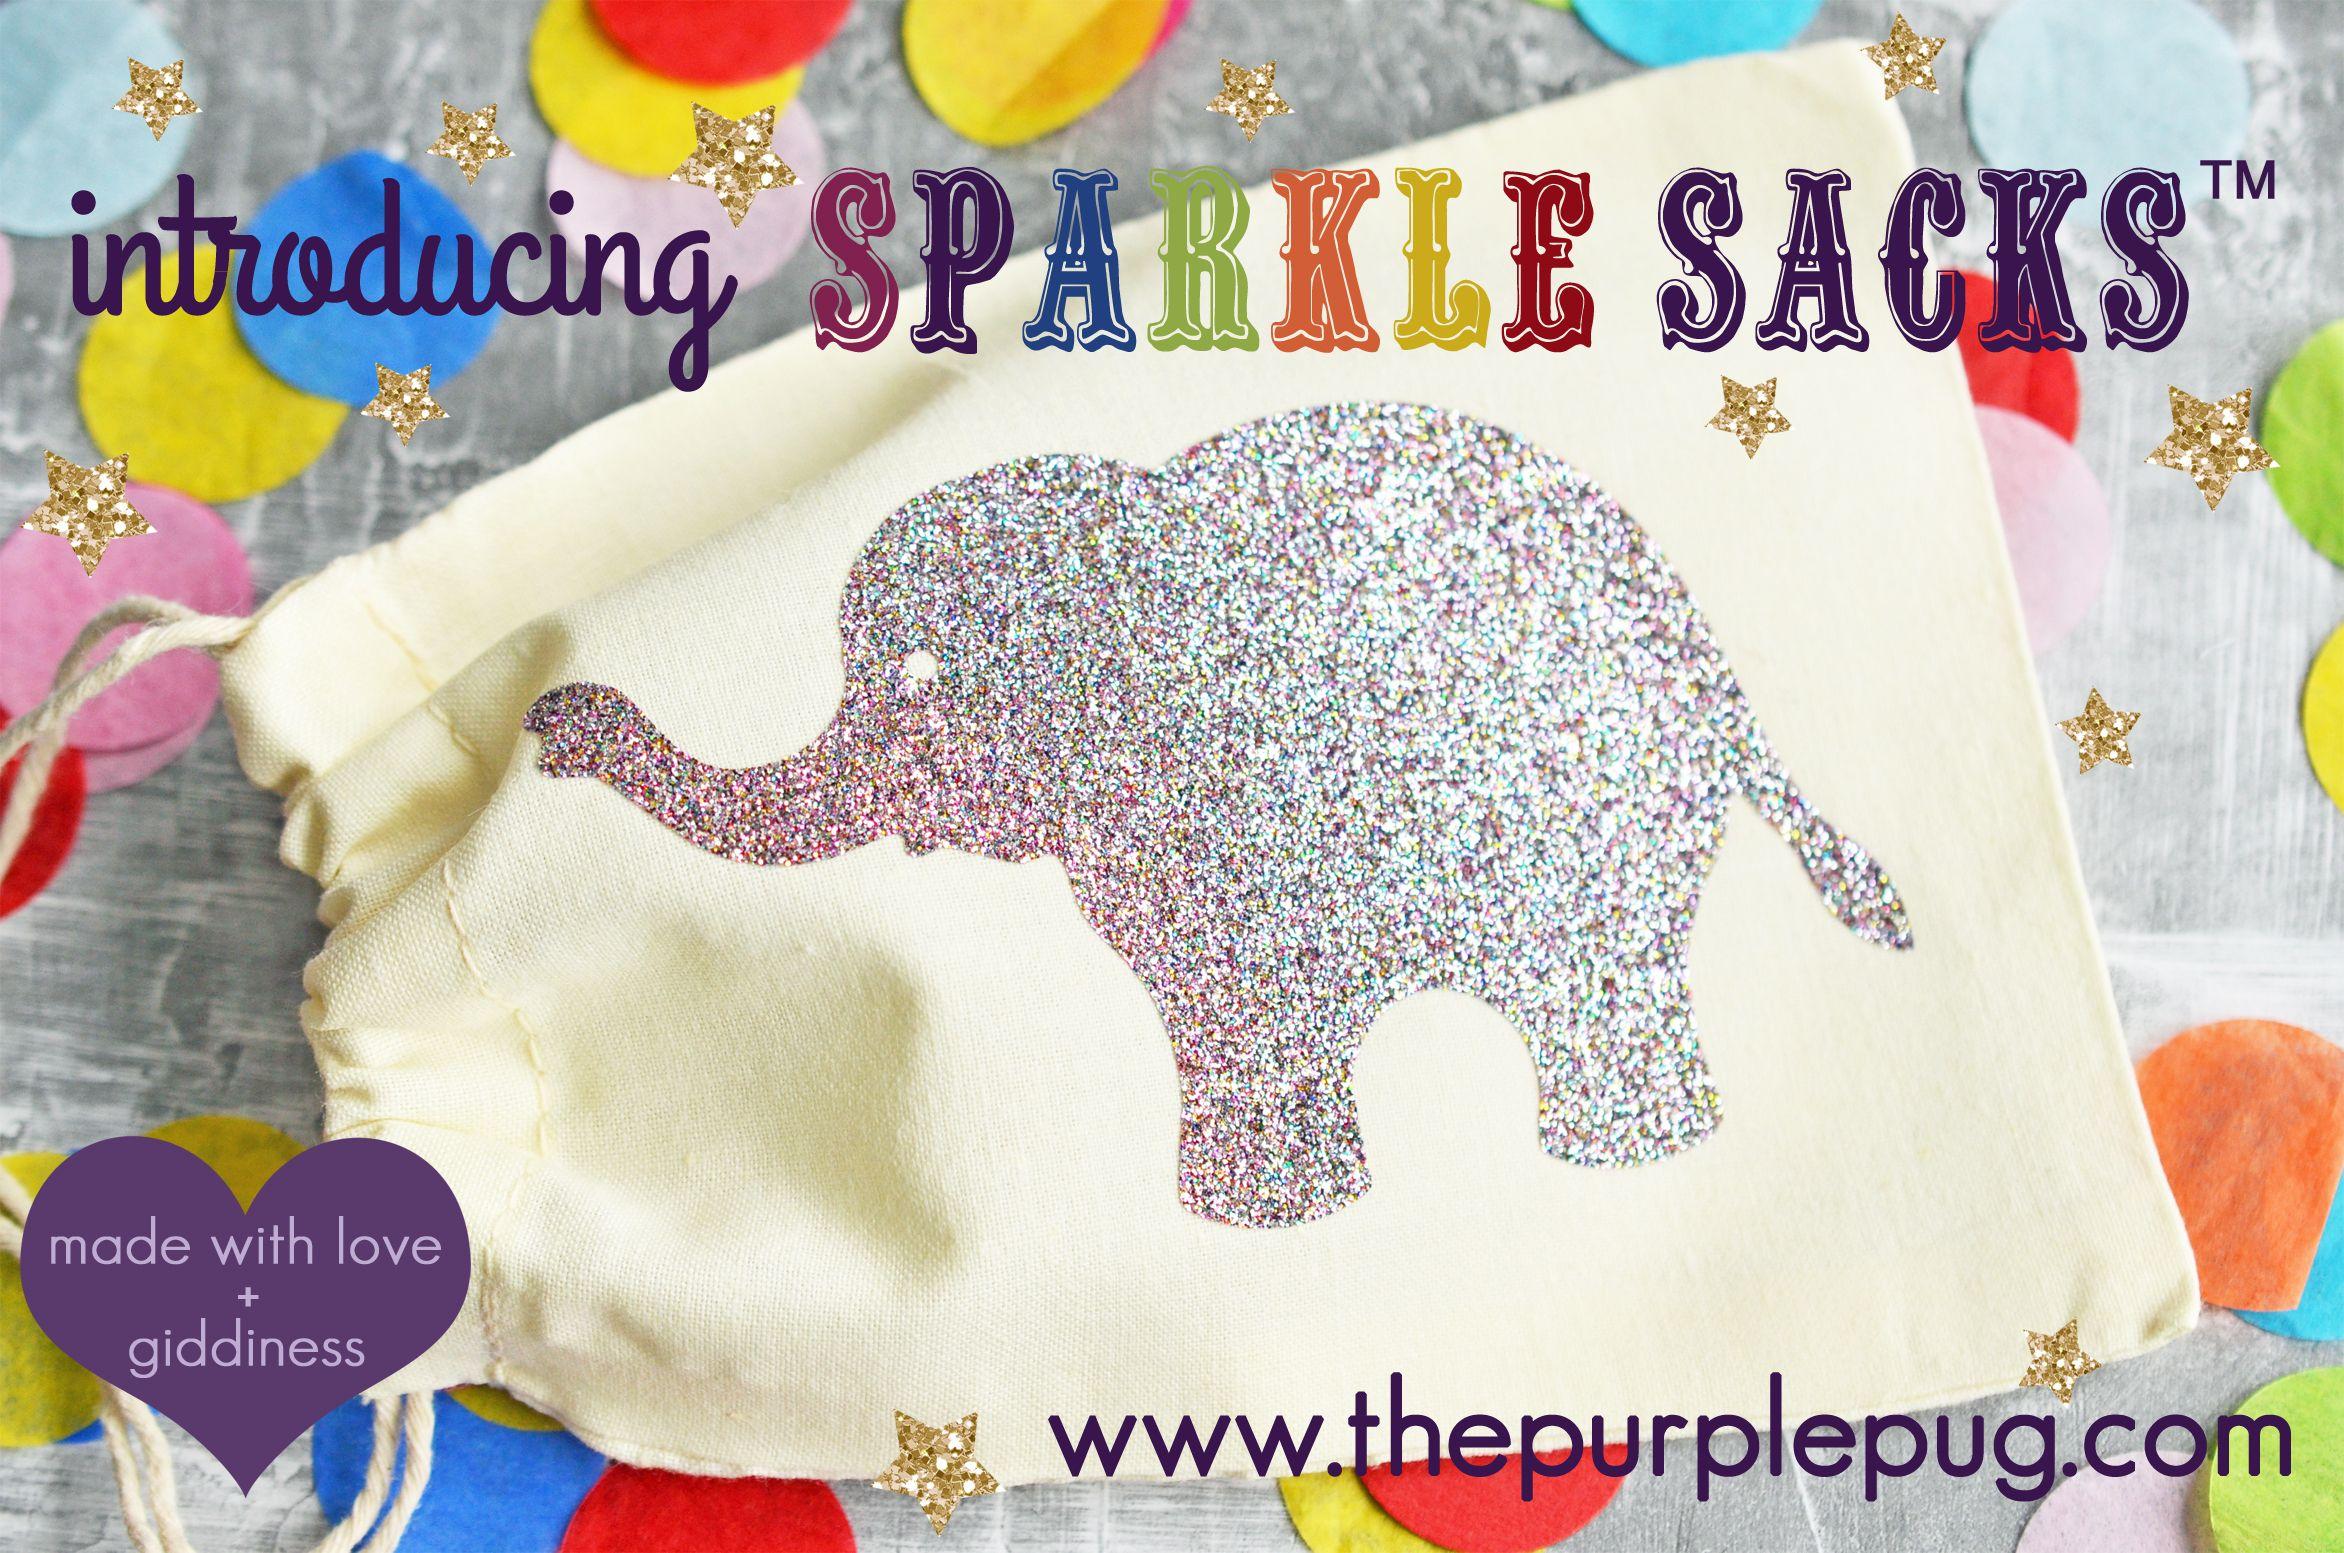 The Purple Pug